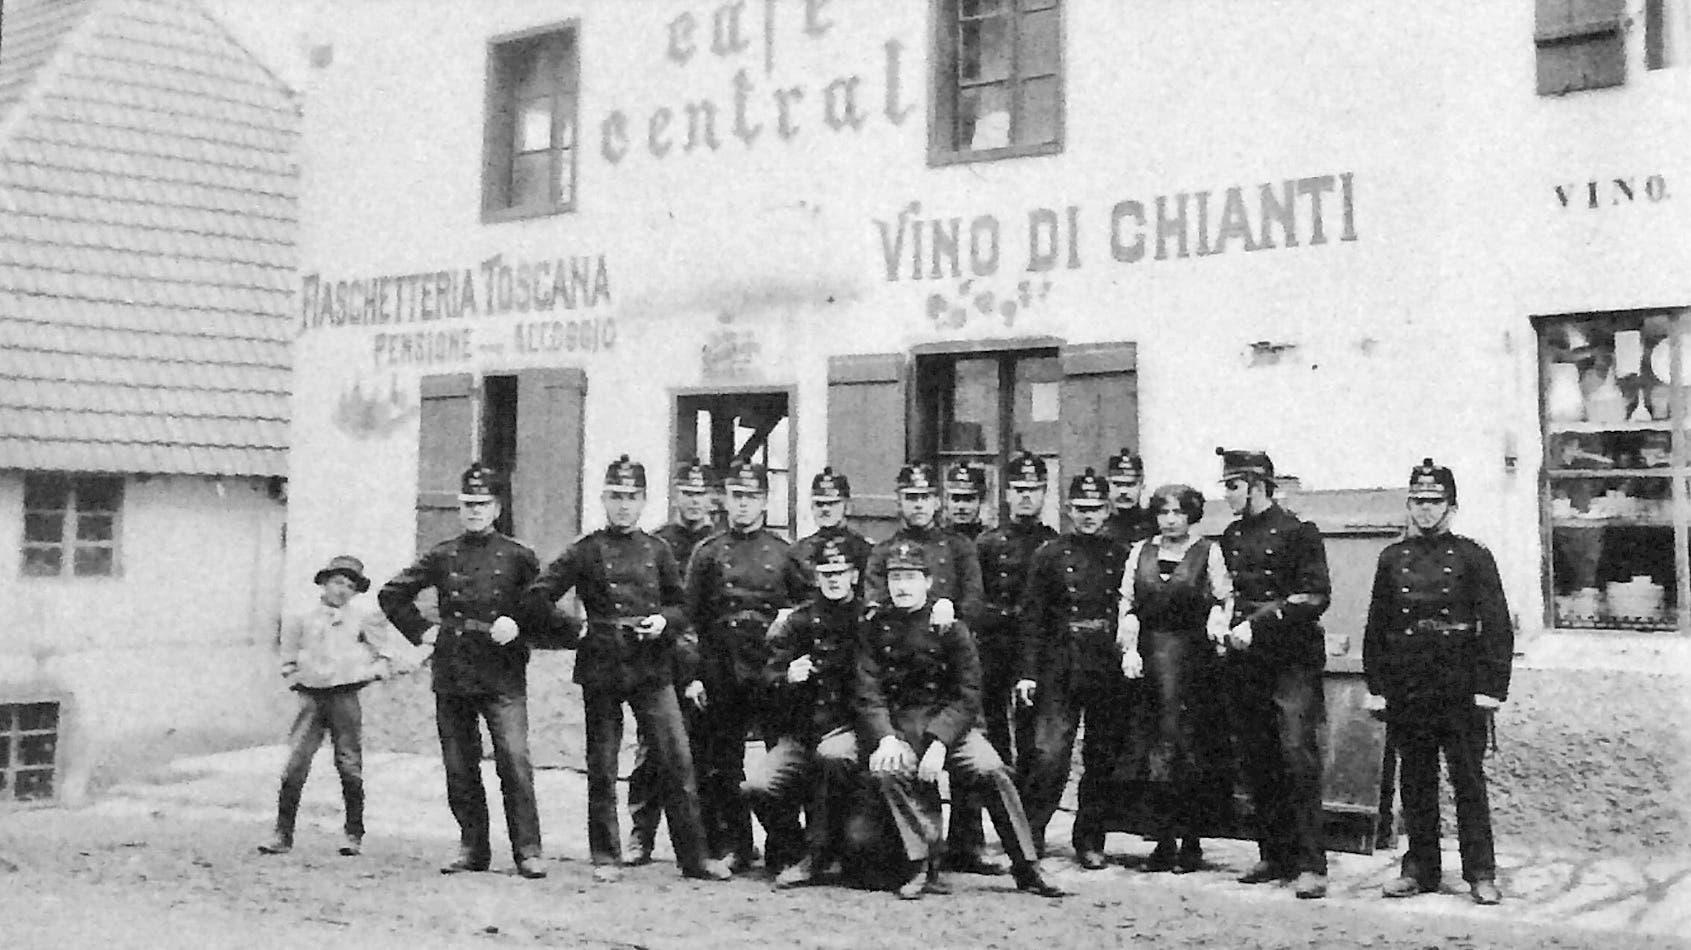 Soldaten vor dem Café Central im Barackendorf Tripolis in Trimbach.